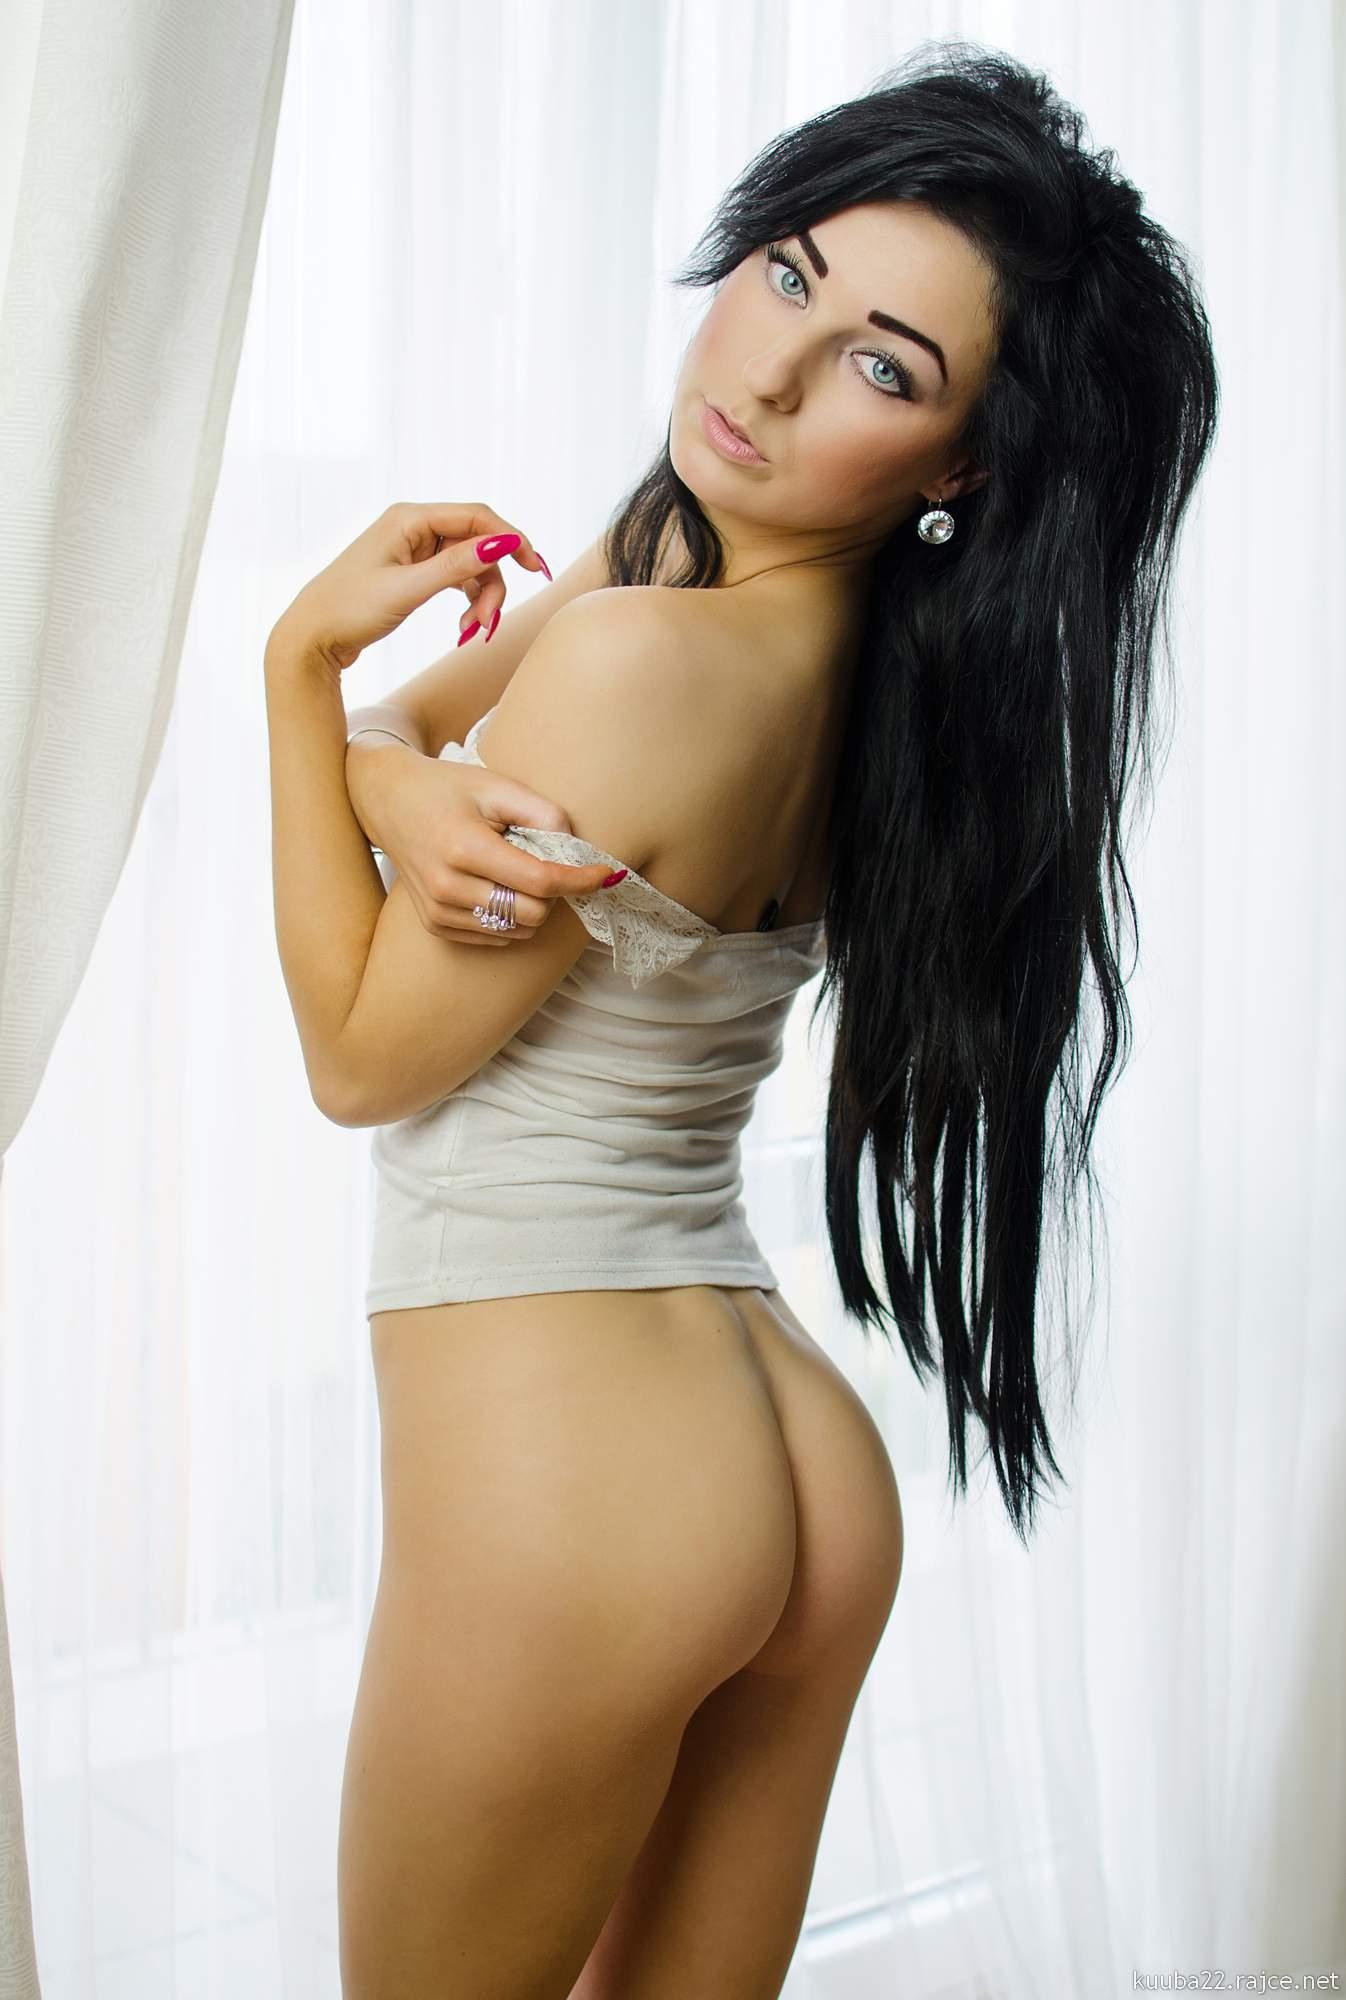 http://img20.rajce.idnes.cz/d2003/12/12061/12061162_45d55d8a31720e051679fc95e701ca88/images/DSC0418.jpg